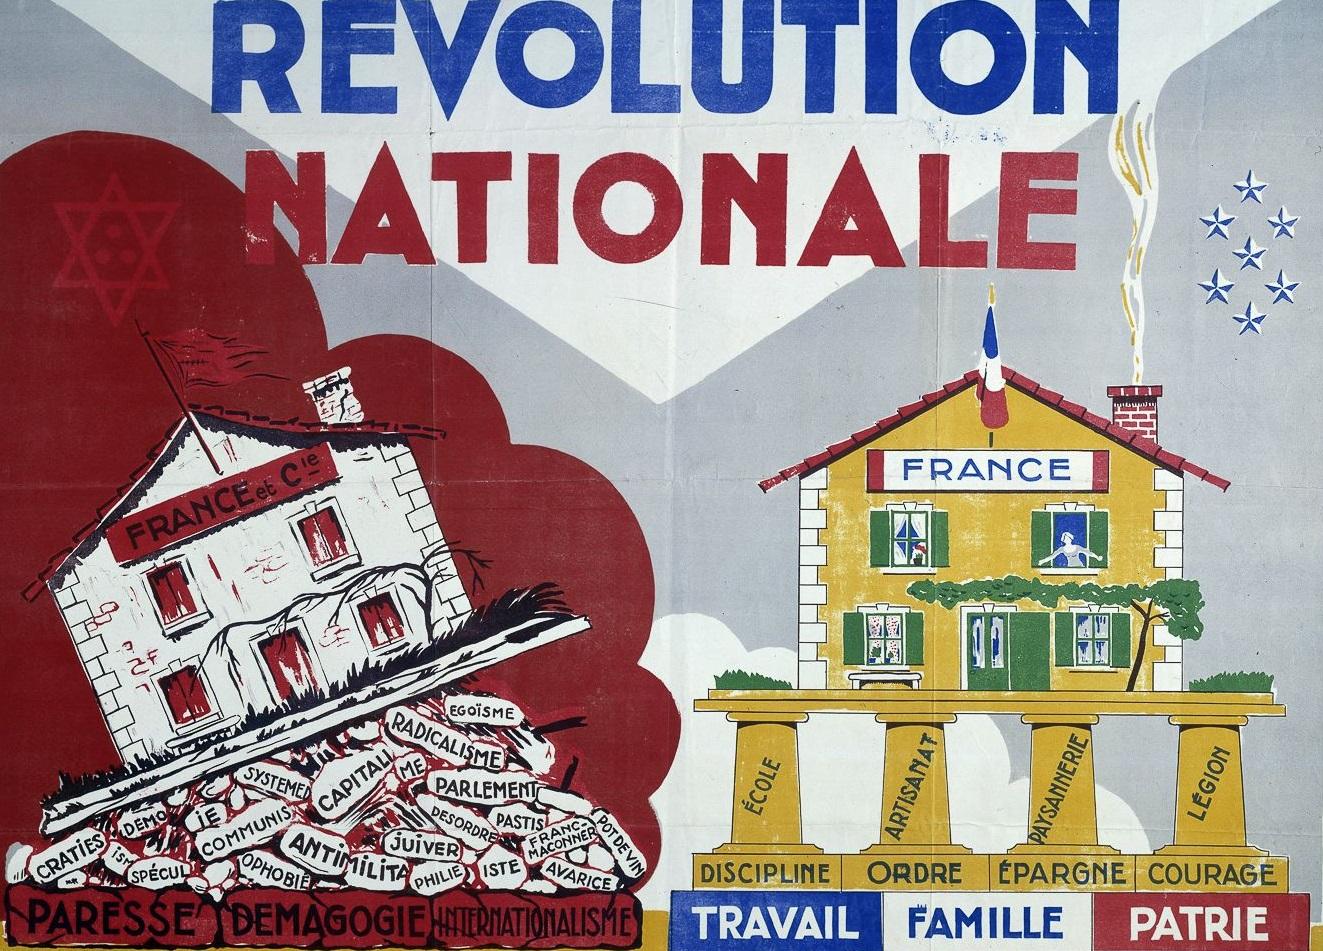 revolution_nationale_propaganda_poster